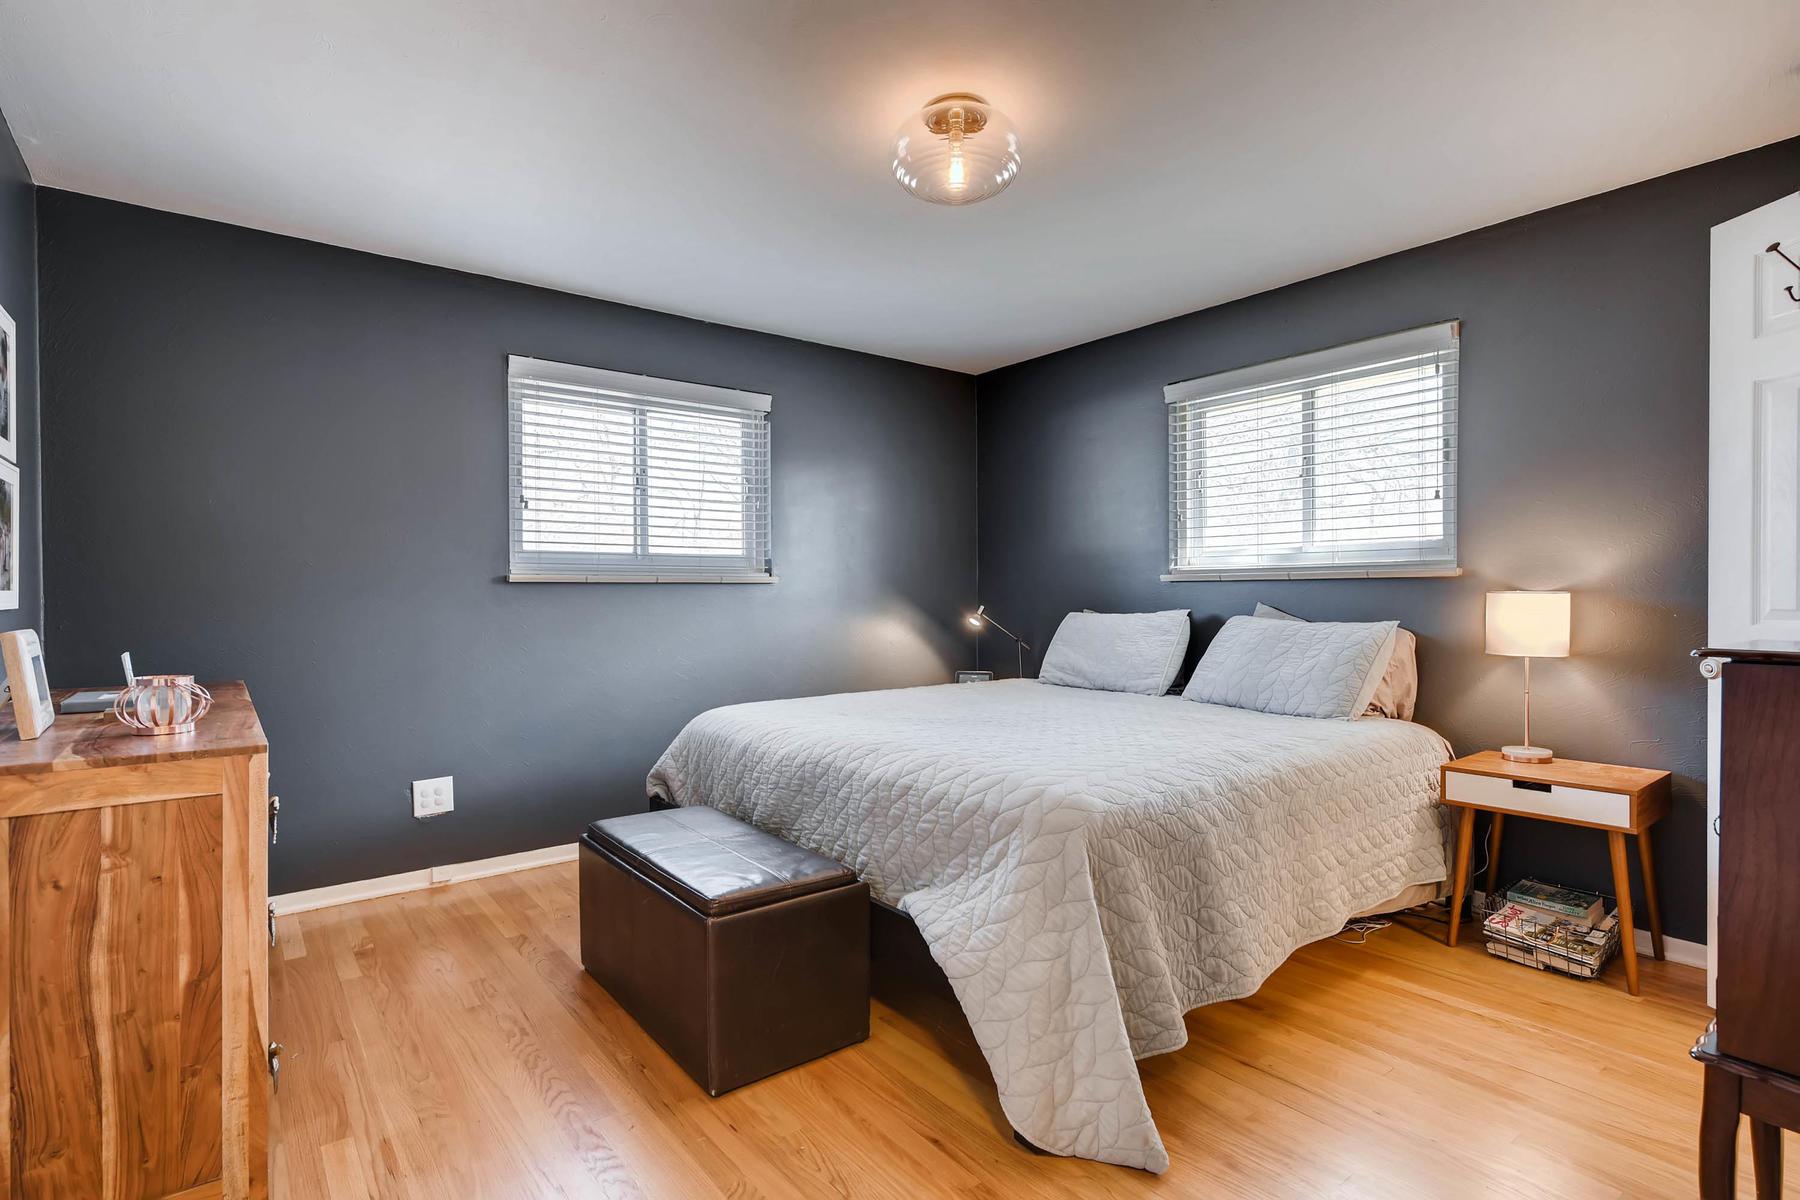 6676 S Kit Carson St-MLS_Size-013-23-Master Bedroom-1800x1200-72dpi.jpg